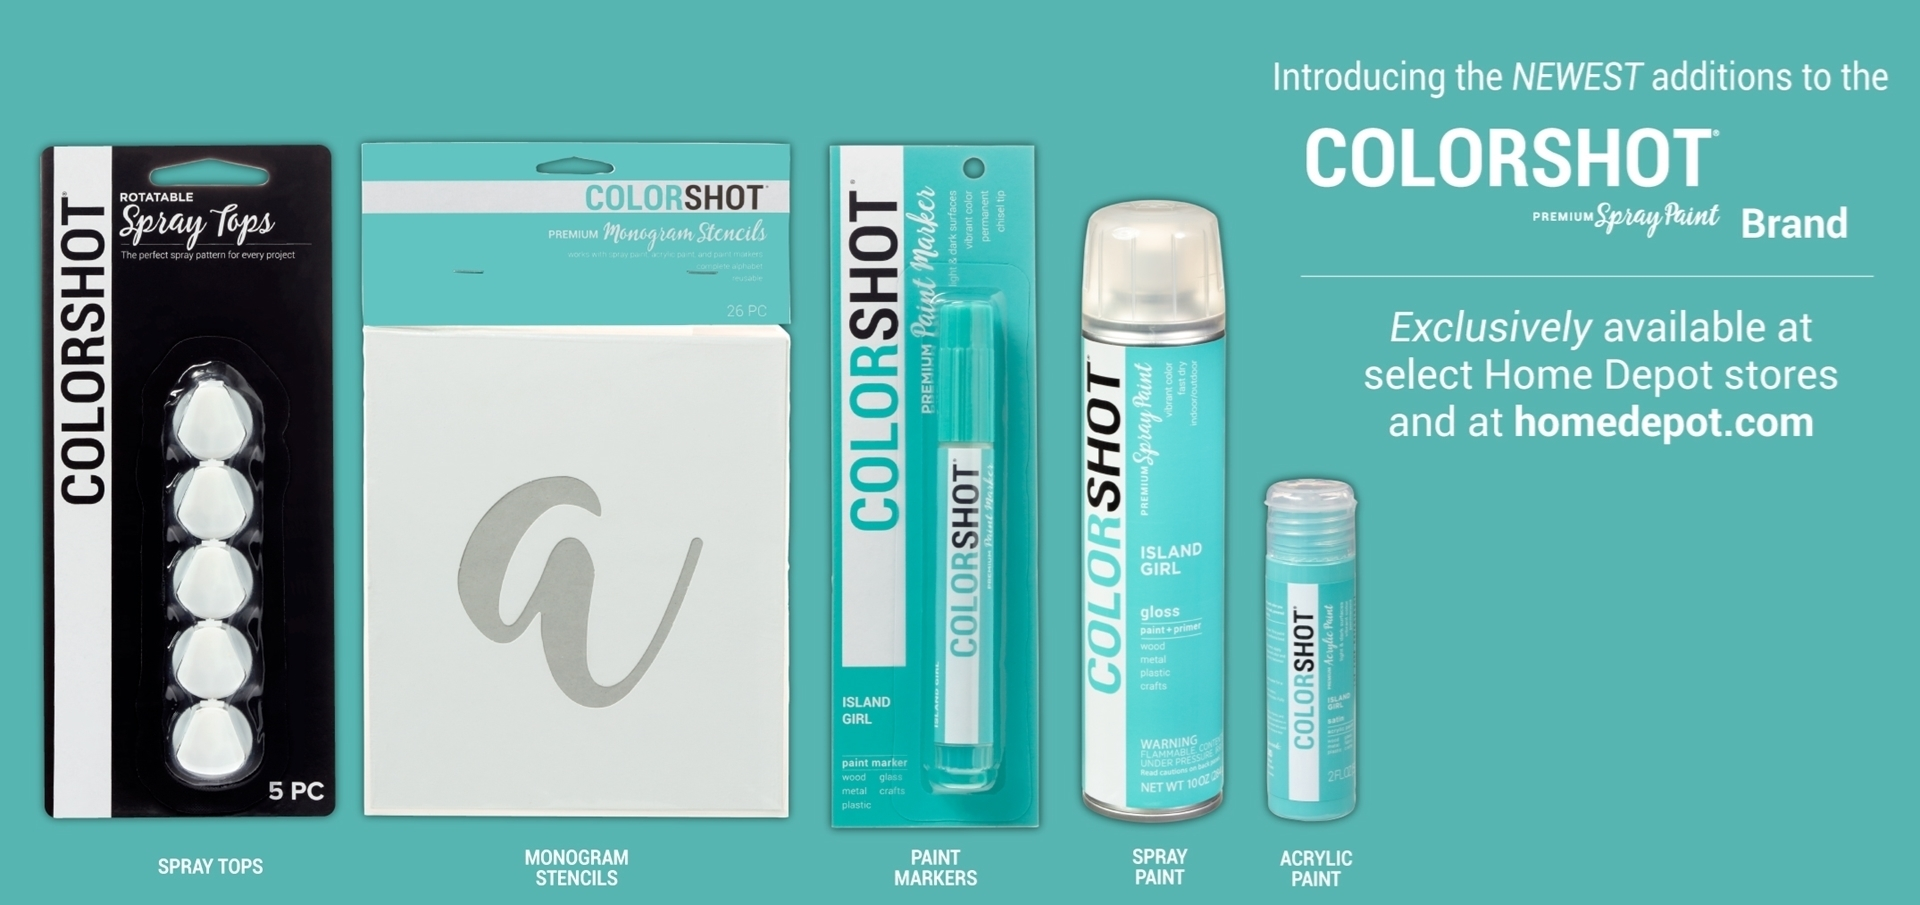 COLORSHOT Line Extension Products